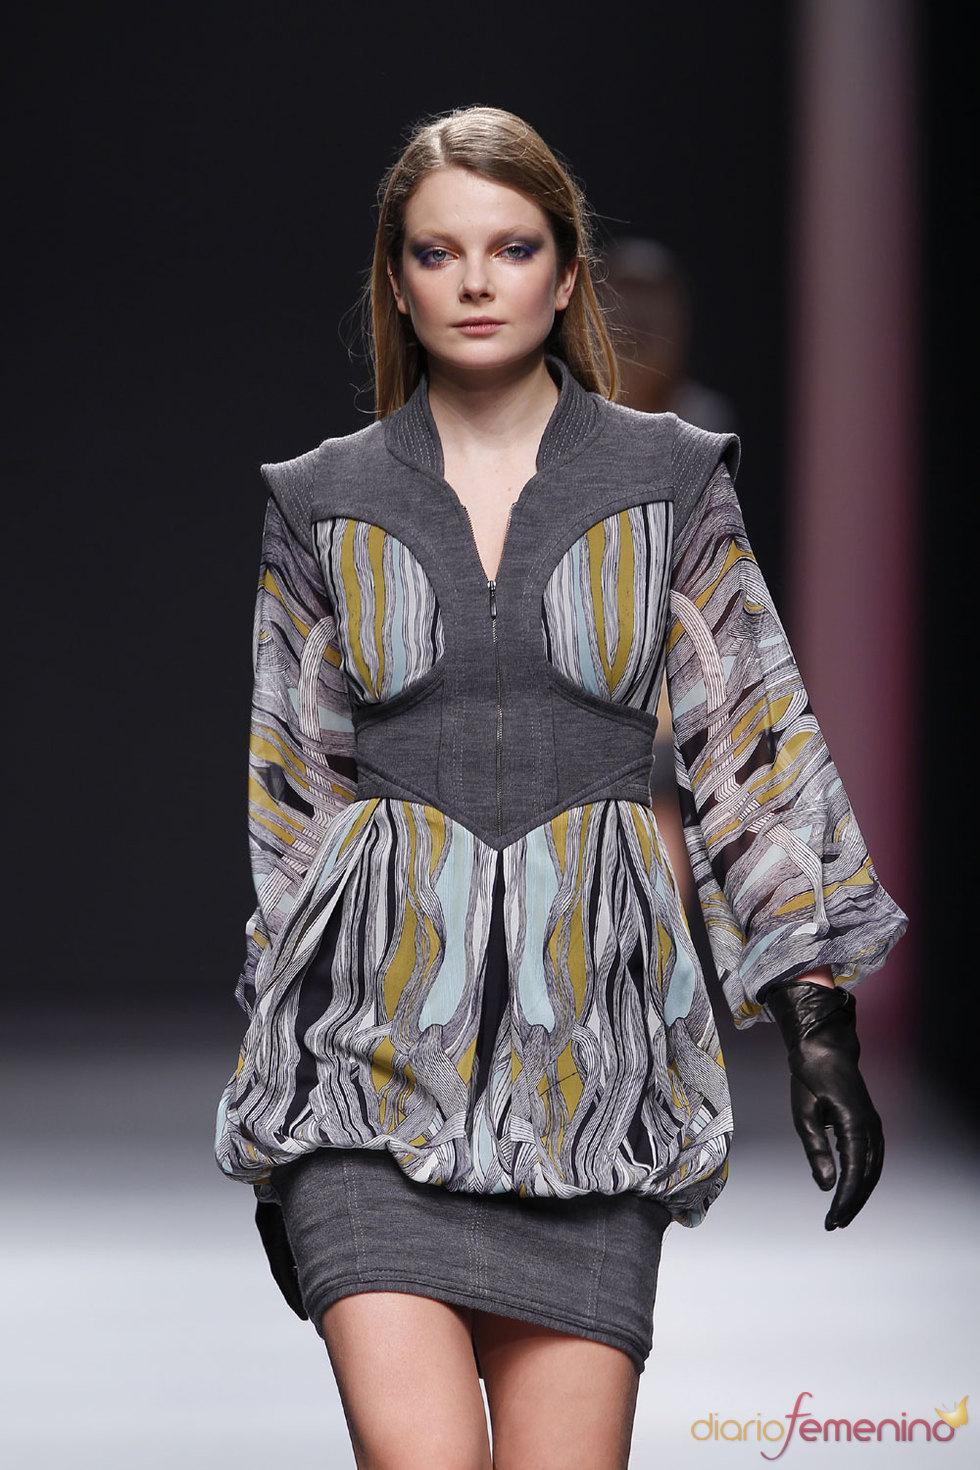 Moda Mujer 2010-2011 de Miriam Ocáriz